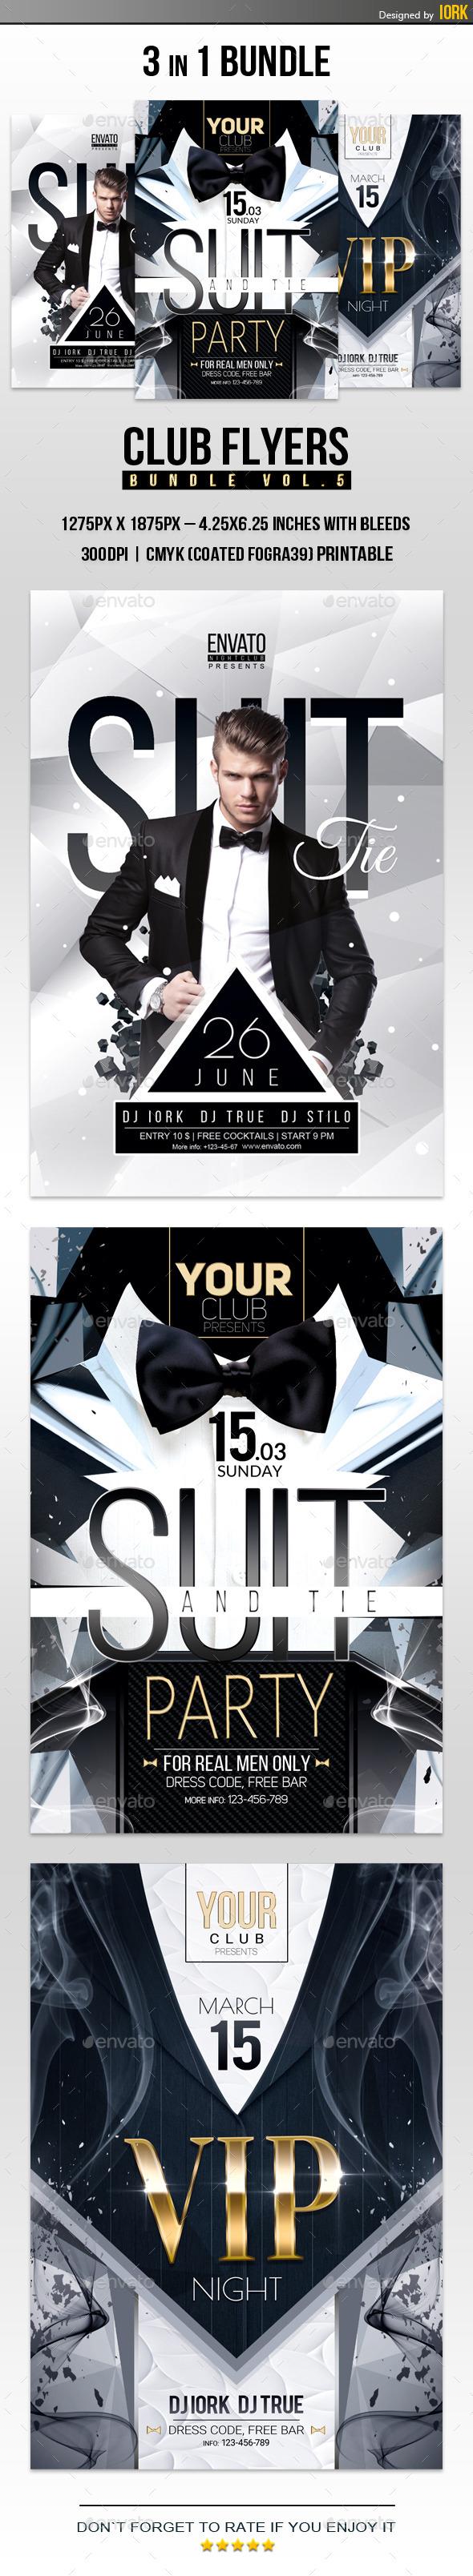 Club Flyers Bundle Vol.5 - Clubs & Parties Events